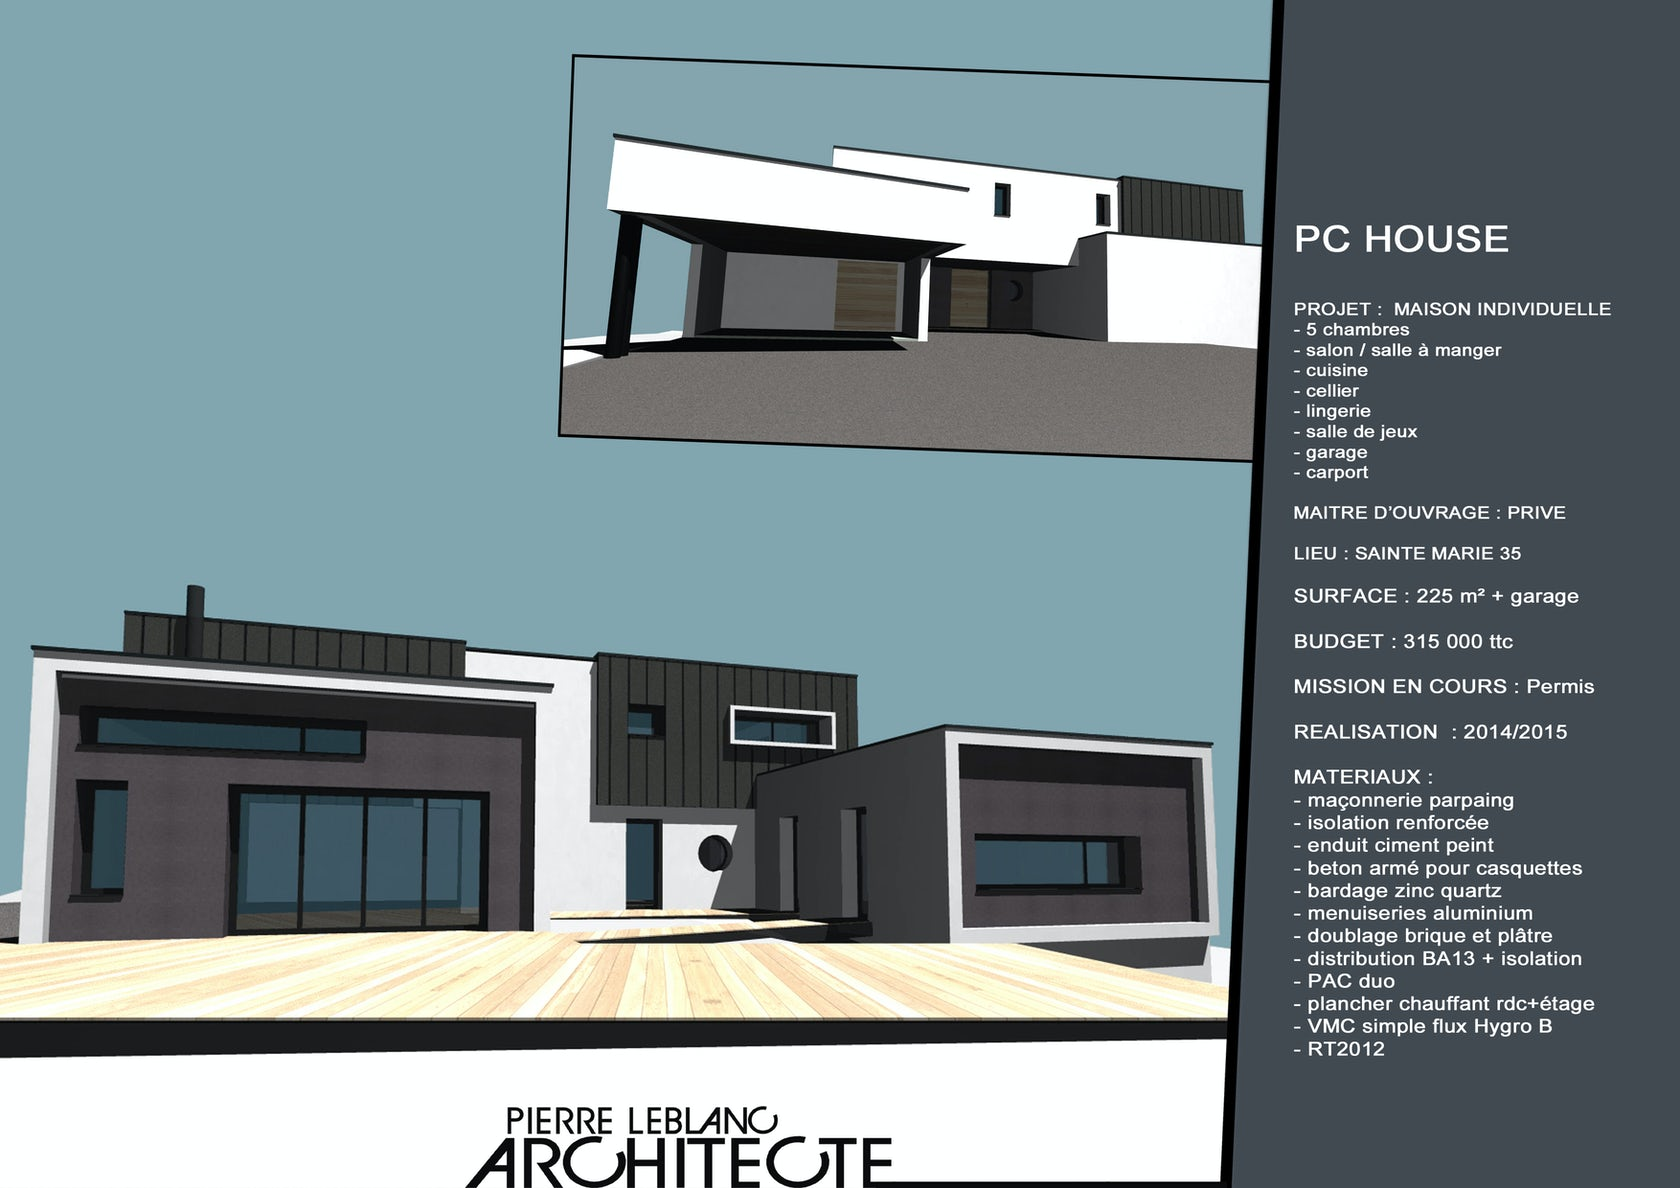 Pierre Leblanc Architecte On Architizer